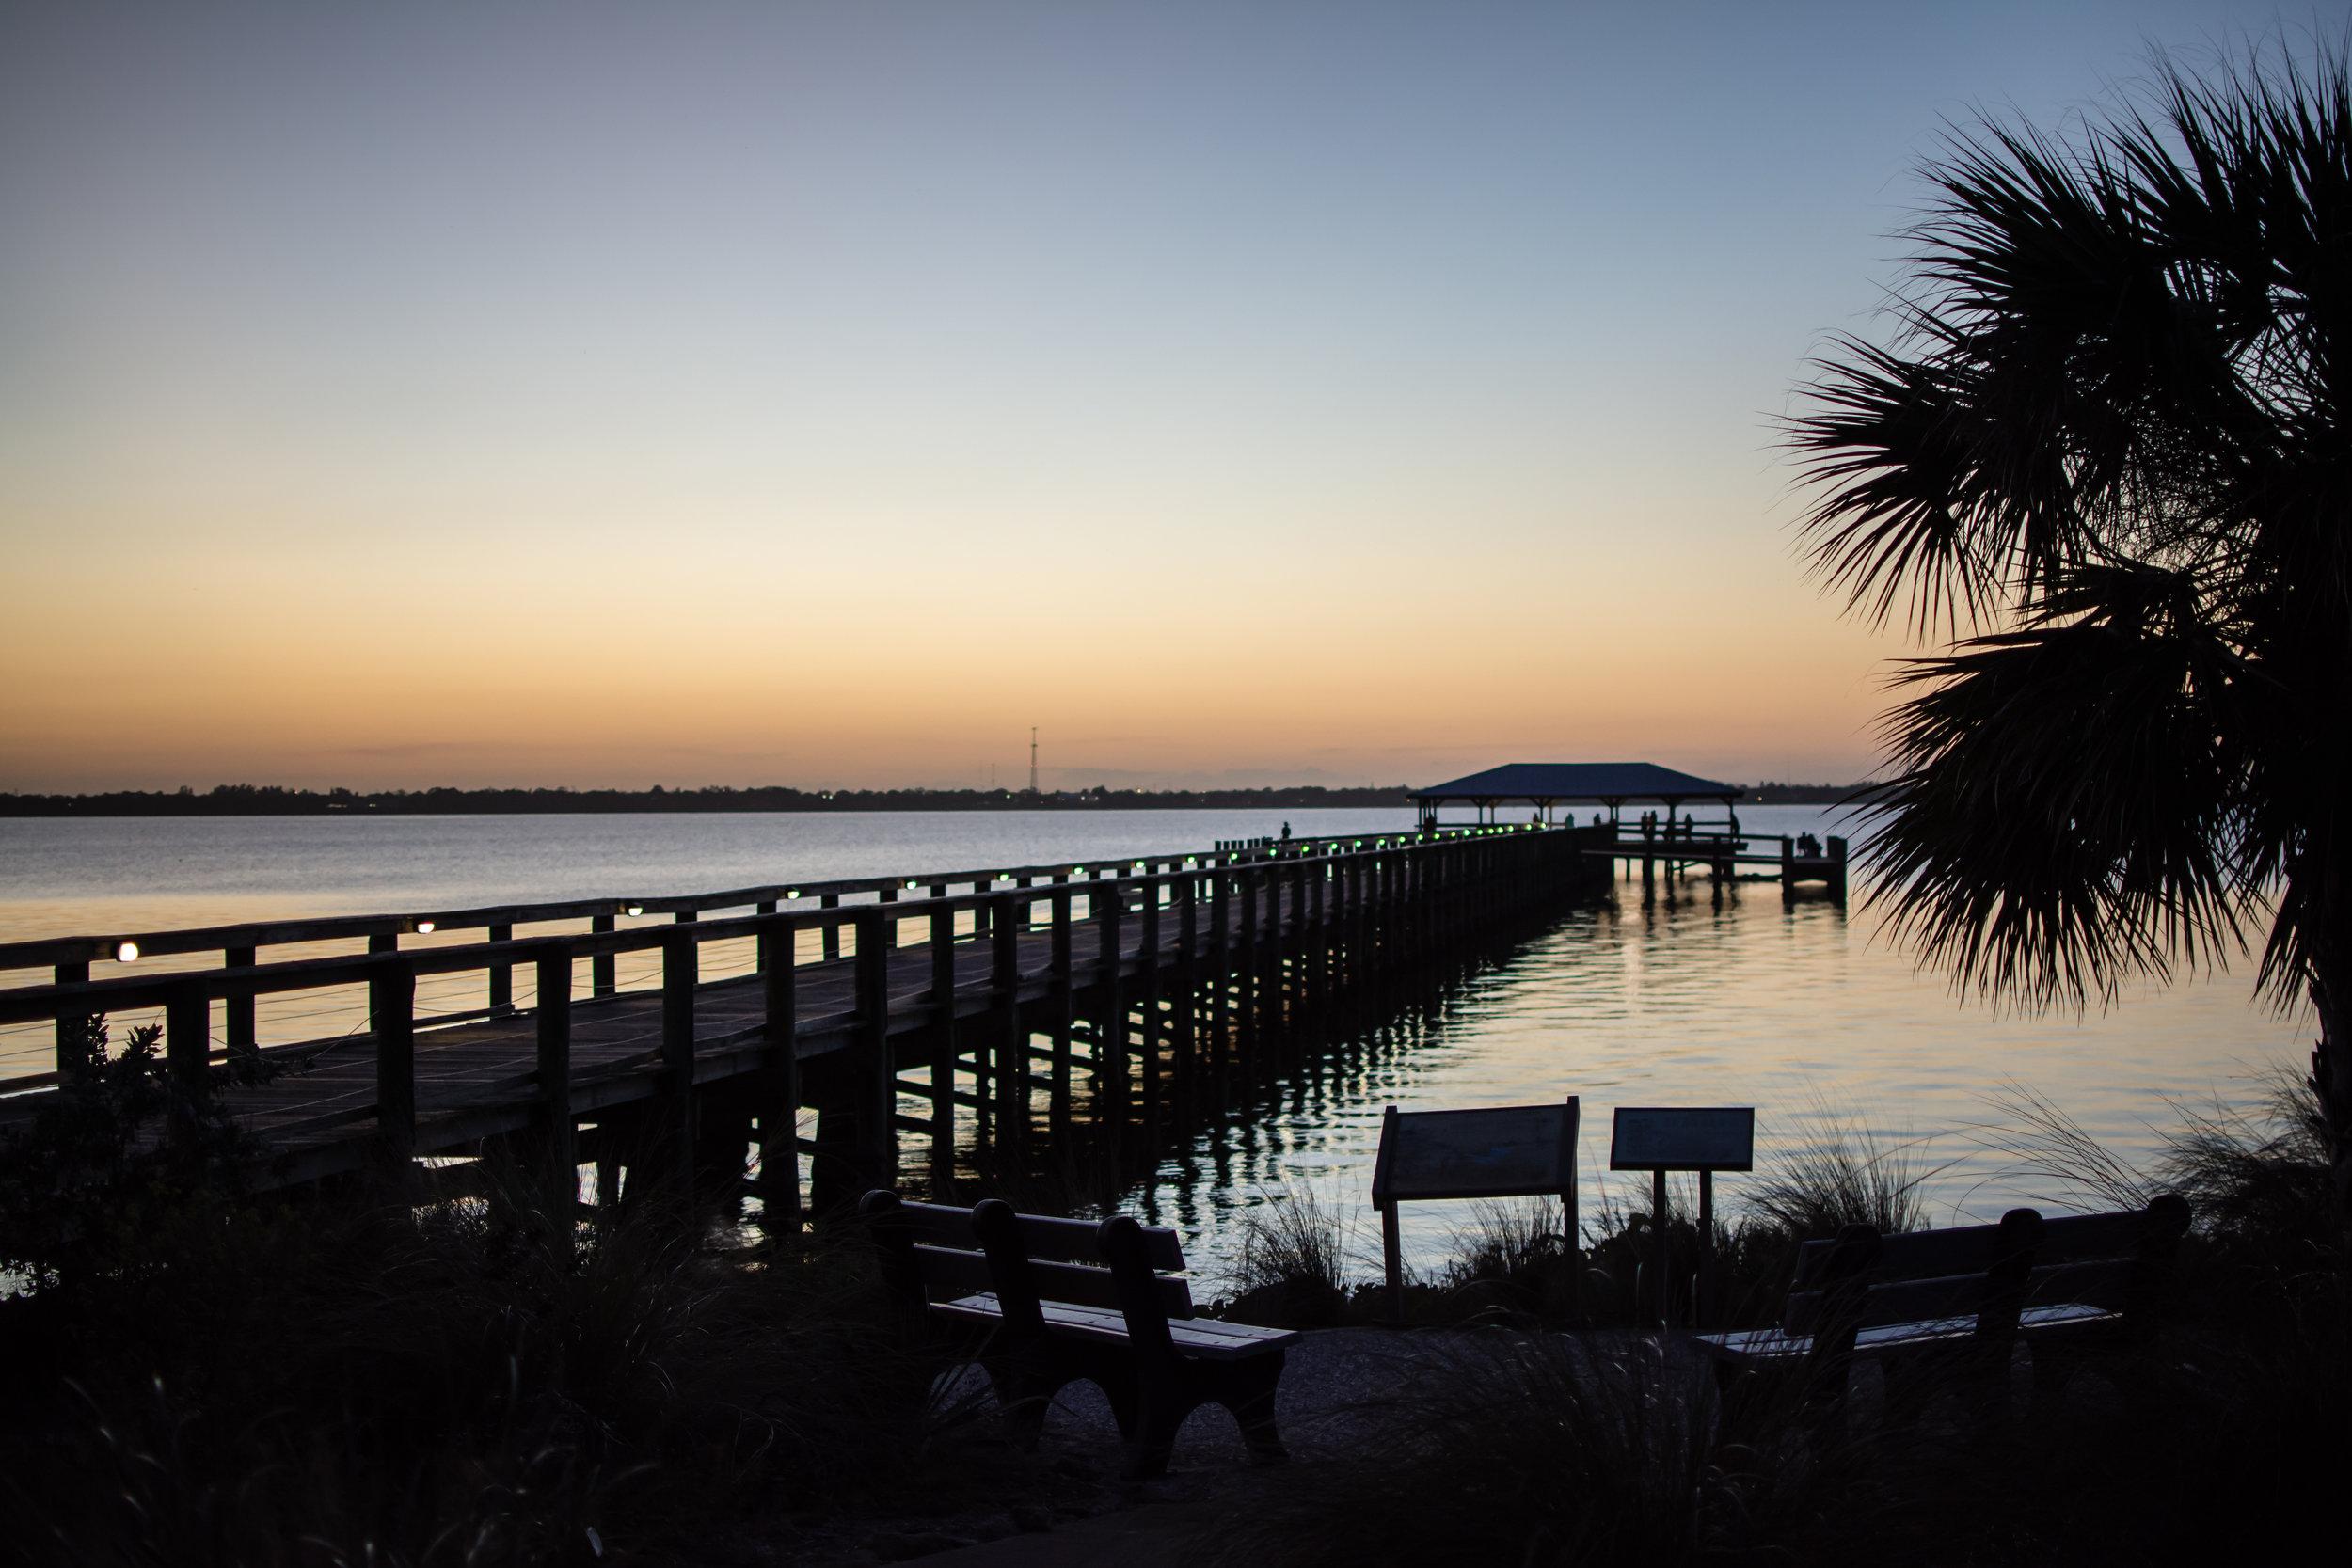 melbourne-beach-sunsets-yanitza-ninett-photography-2